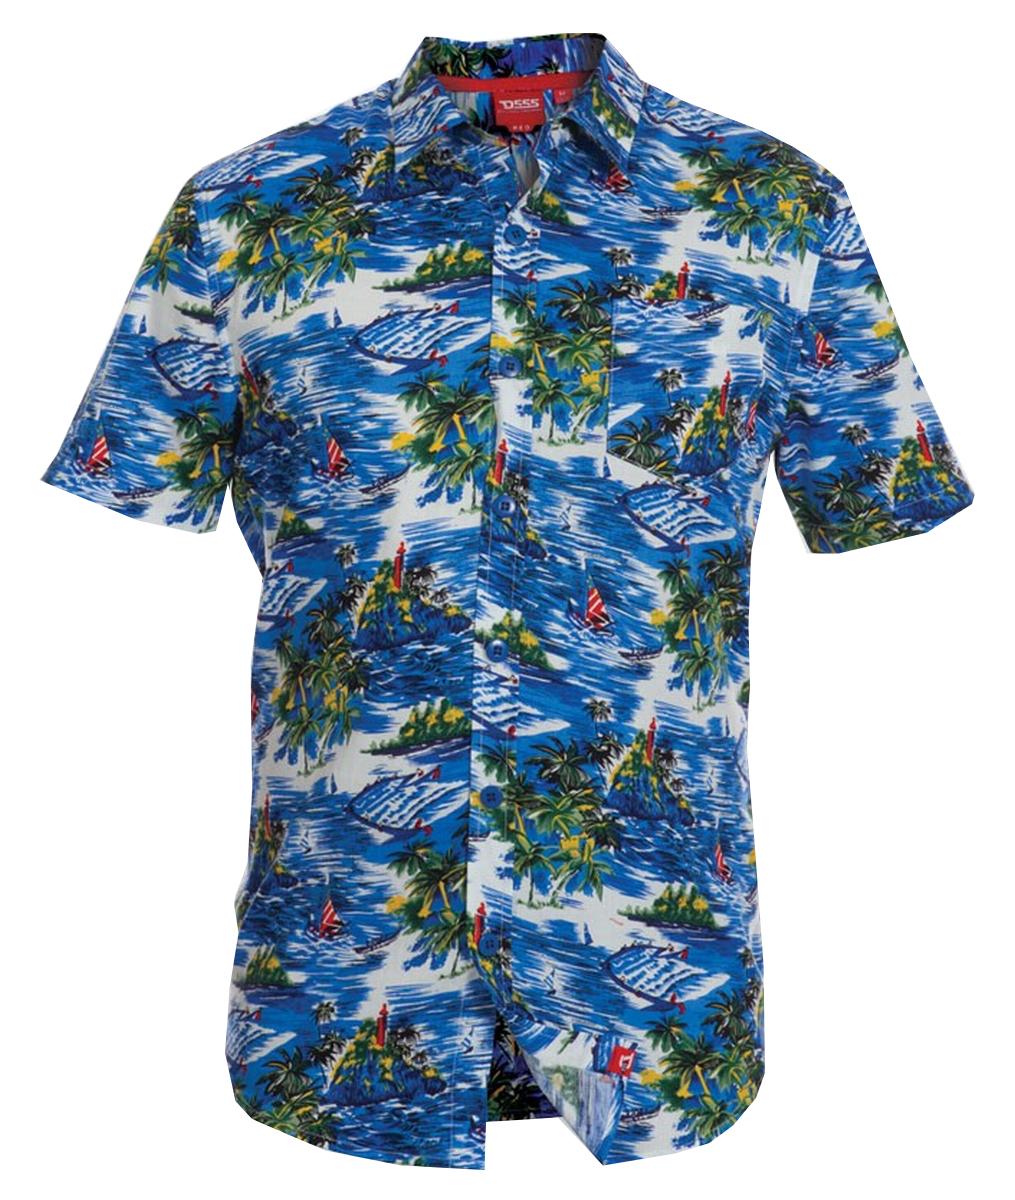 Mens Extra Large Big Size 4xl Hawaiian Shirt Short Sleeve